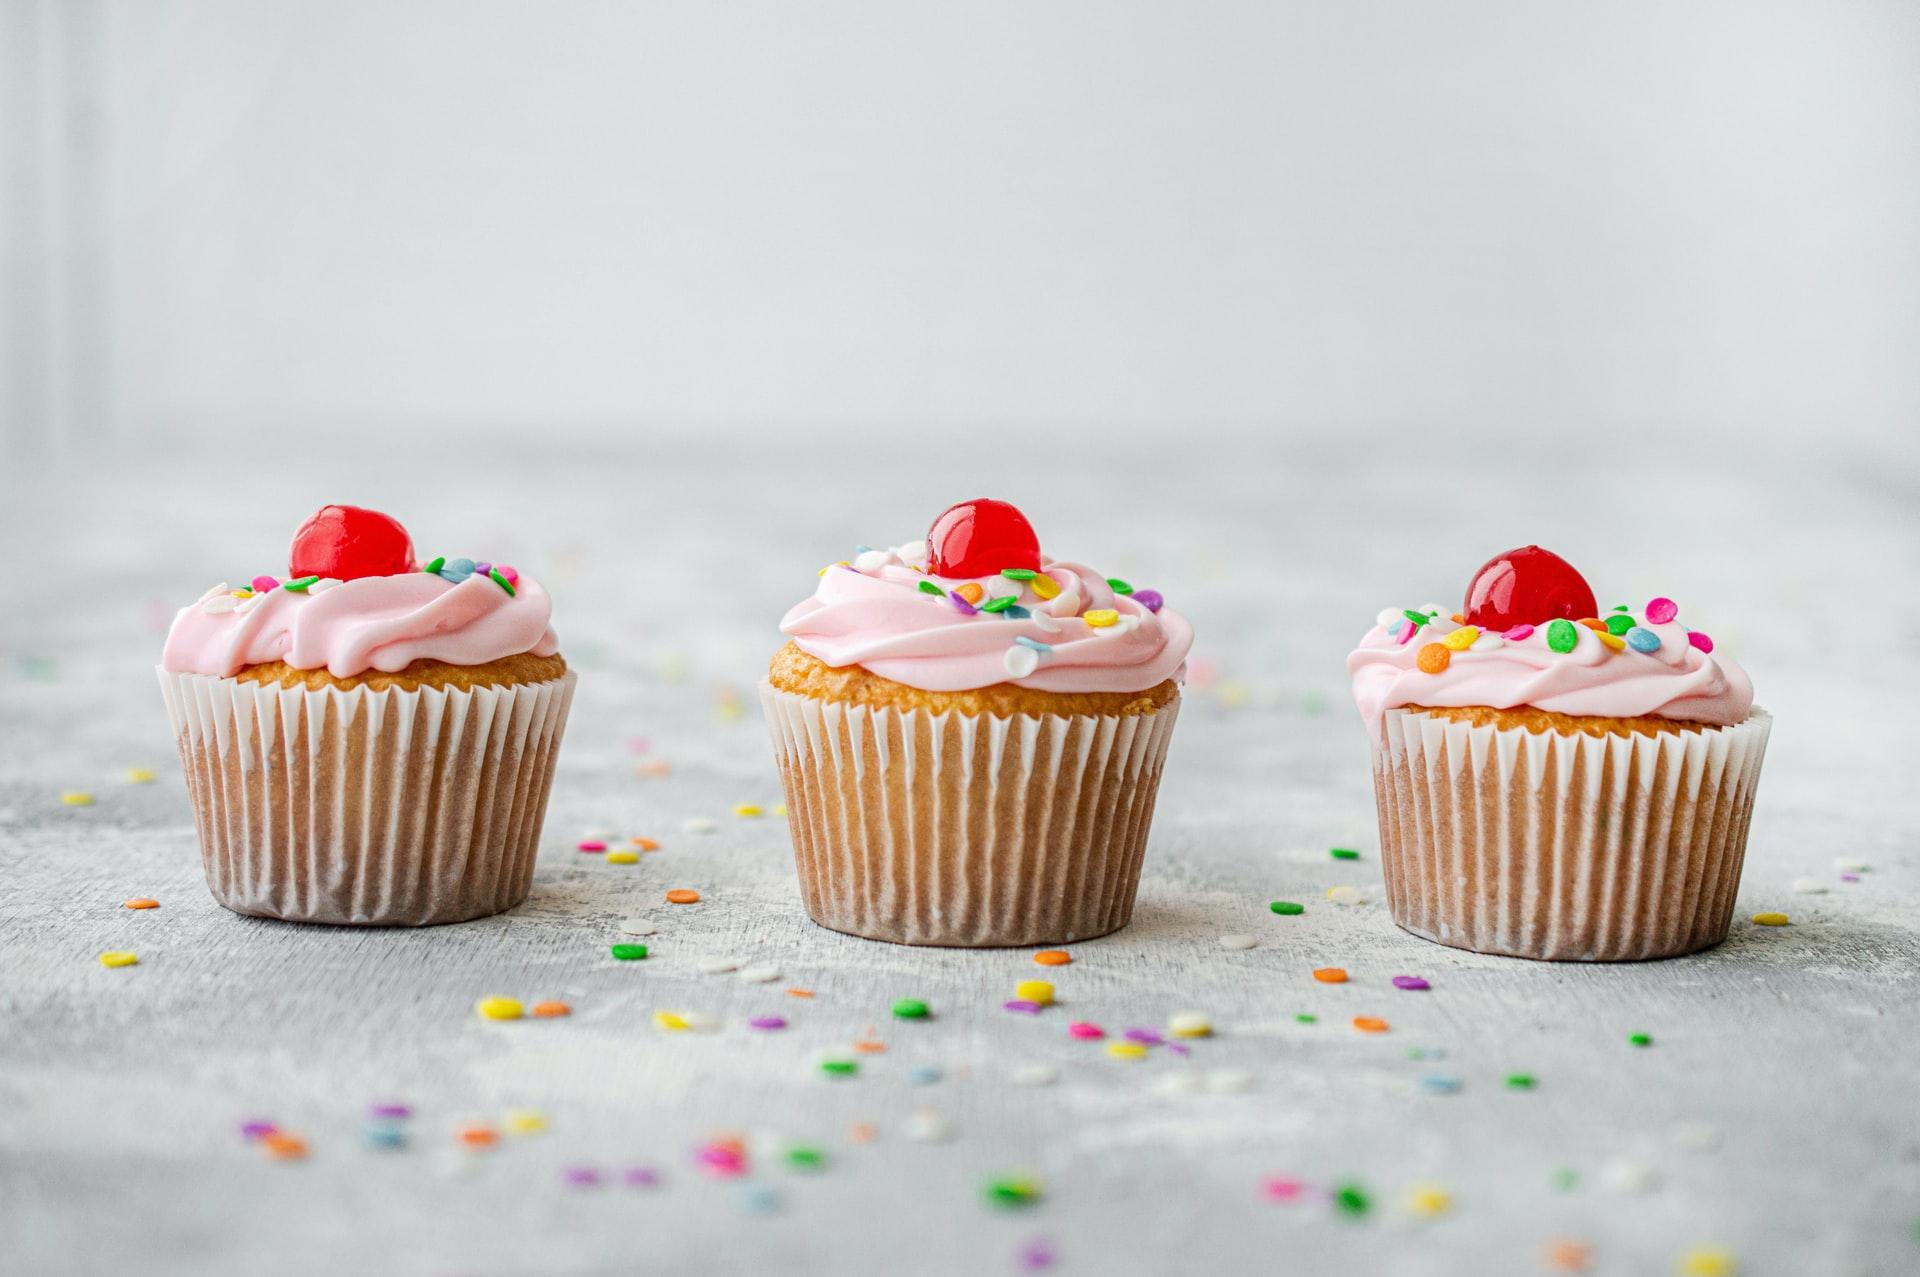 Savor Seasonally Inspired Sweets at Georgetown Cupcake